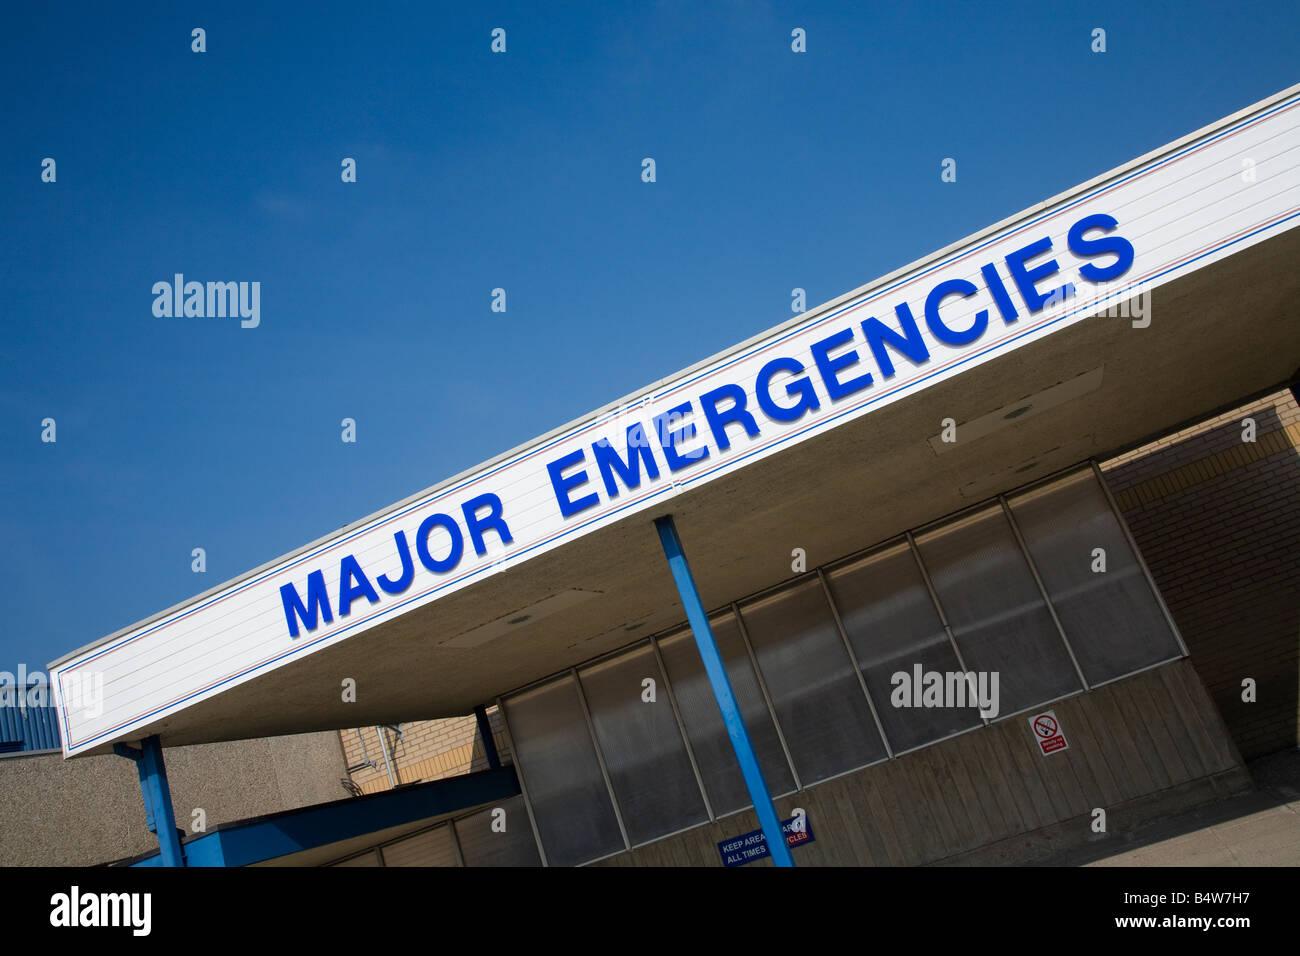 Major Emergency reception bay Royal Shrewsbury Hospital Shropshire England UK United Kingdom GB Great Britain British - Stock Image